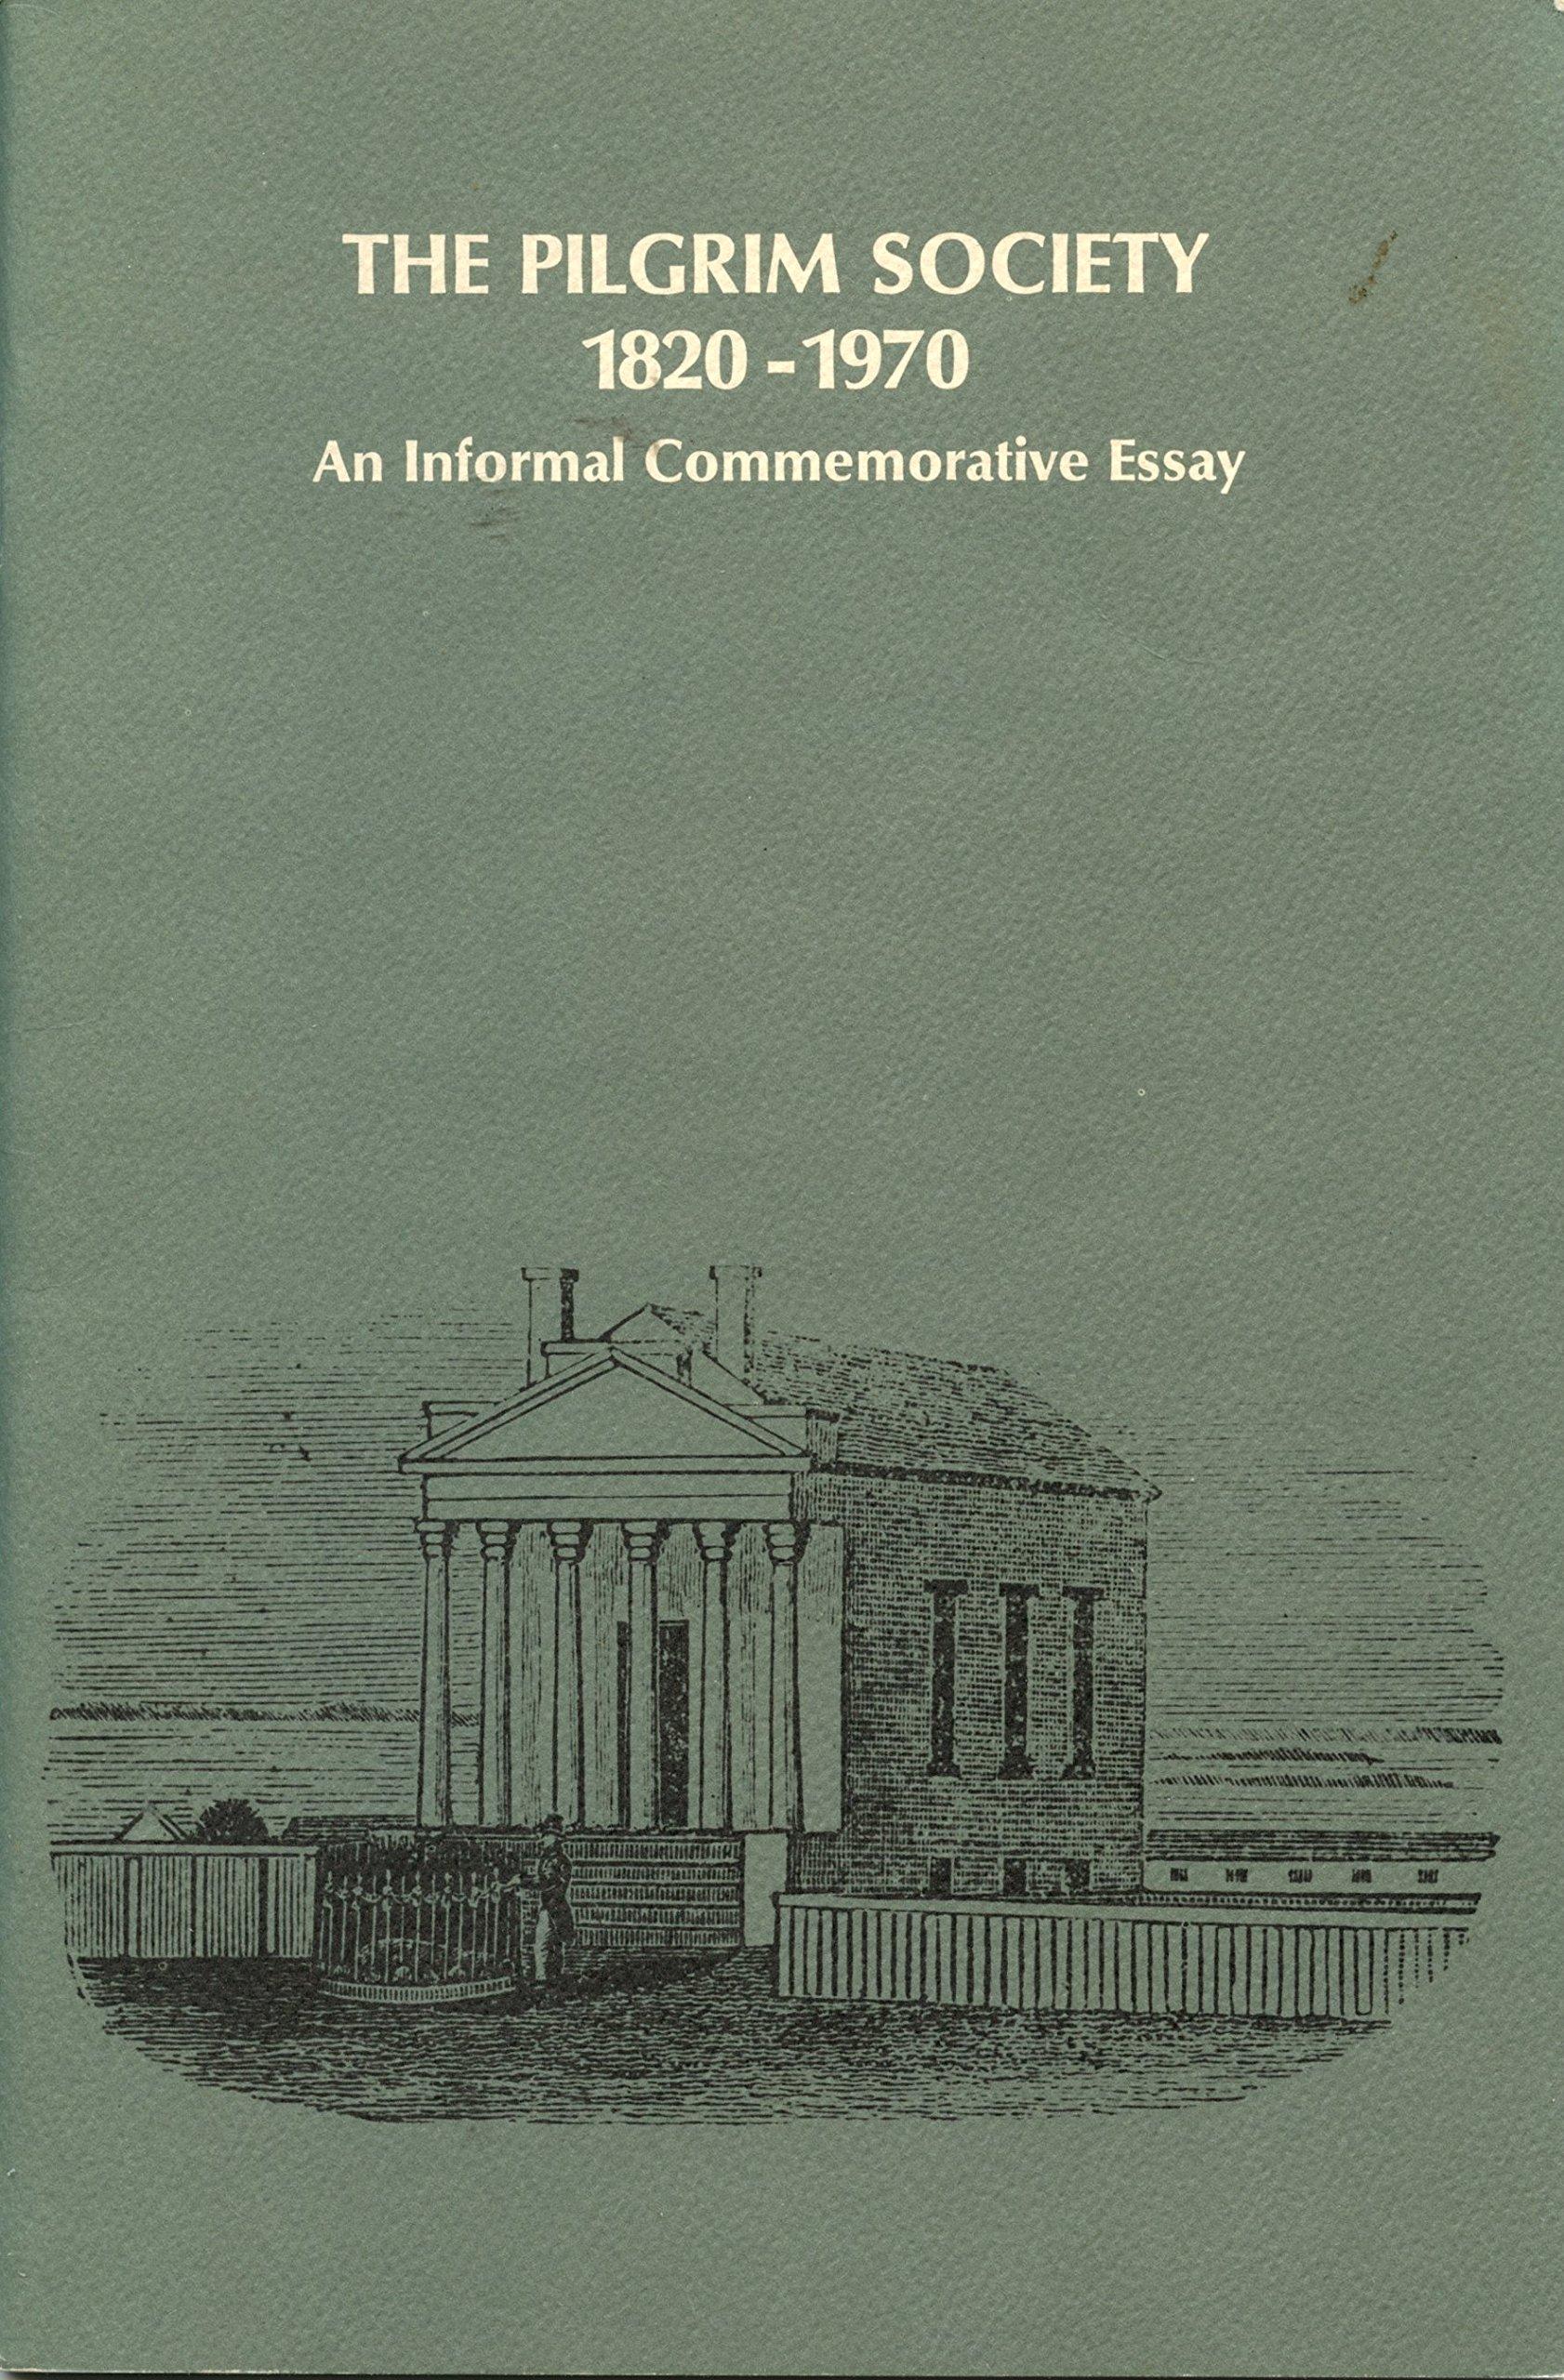 The Pilgrim Society, 1820-1970;: An informal commemorative essay (Pilgrim  Society booklet series): Gomes, Peter J: Amazon.com: Books